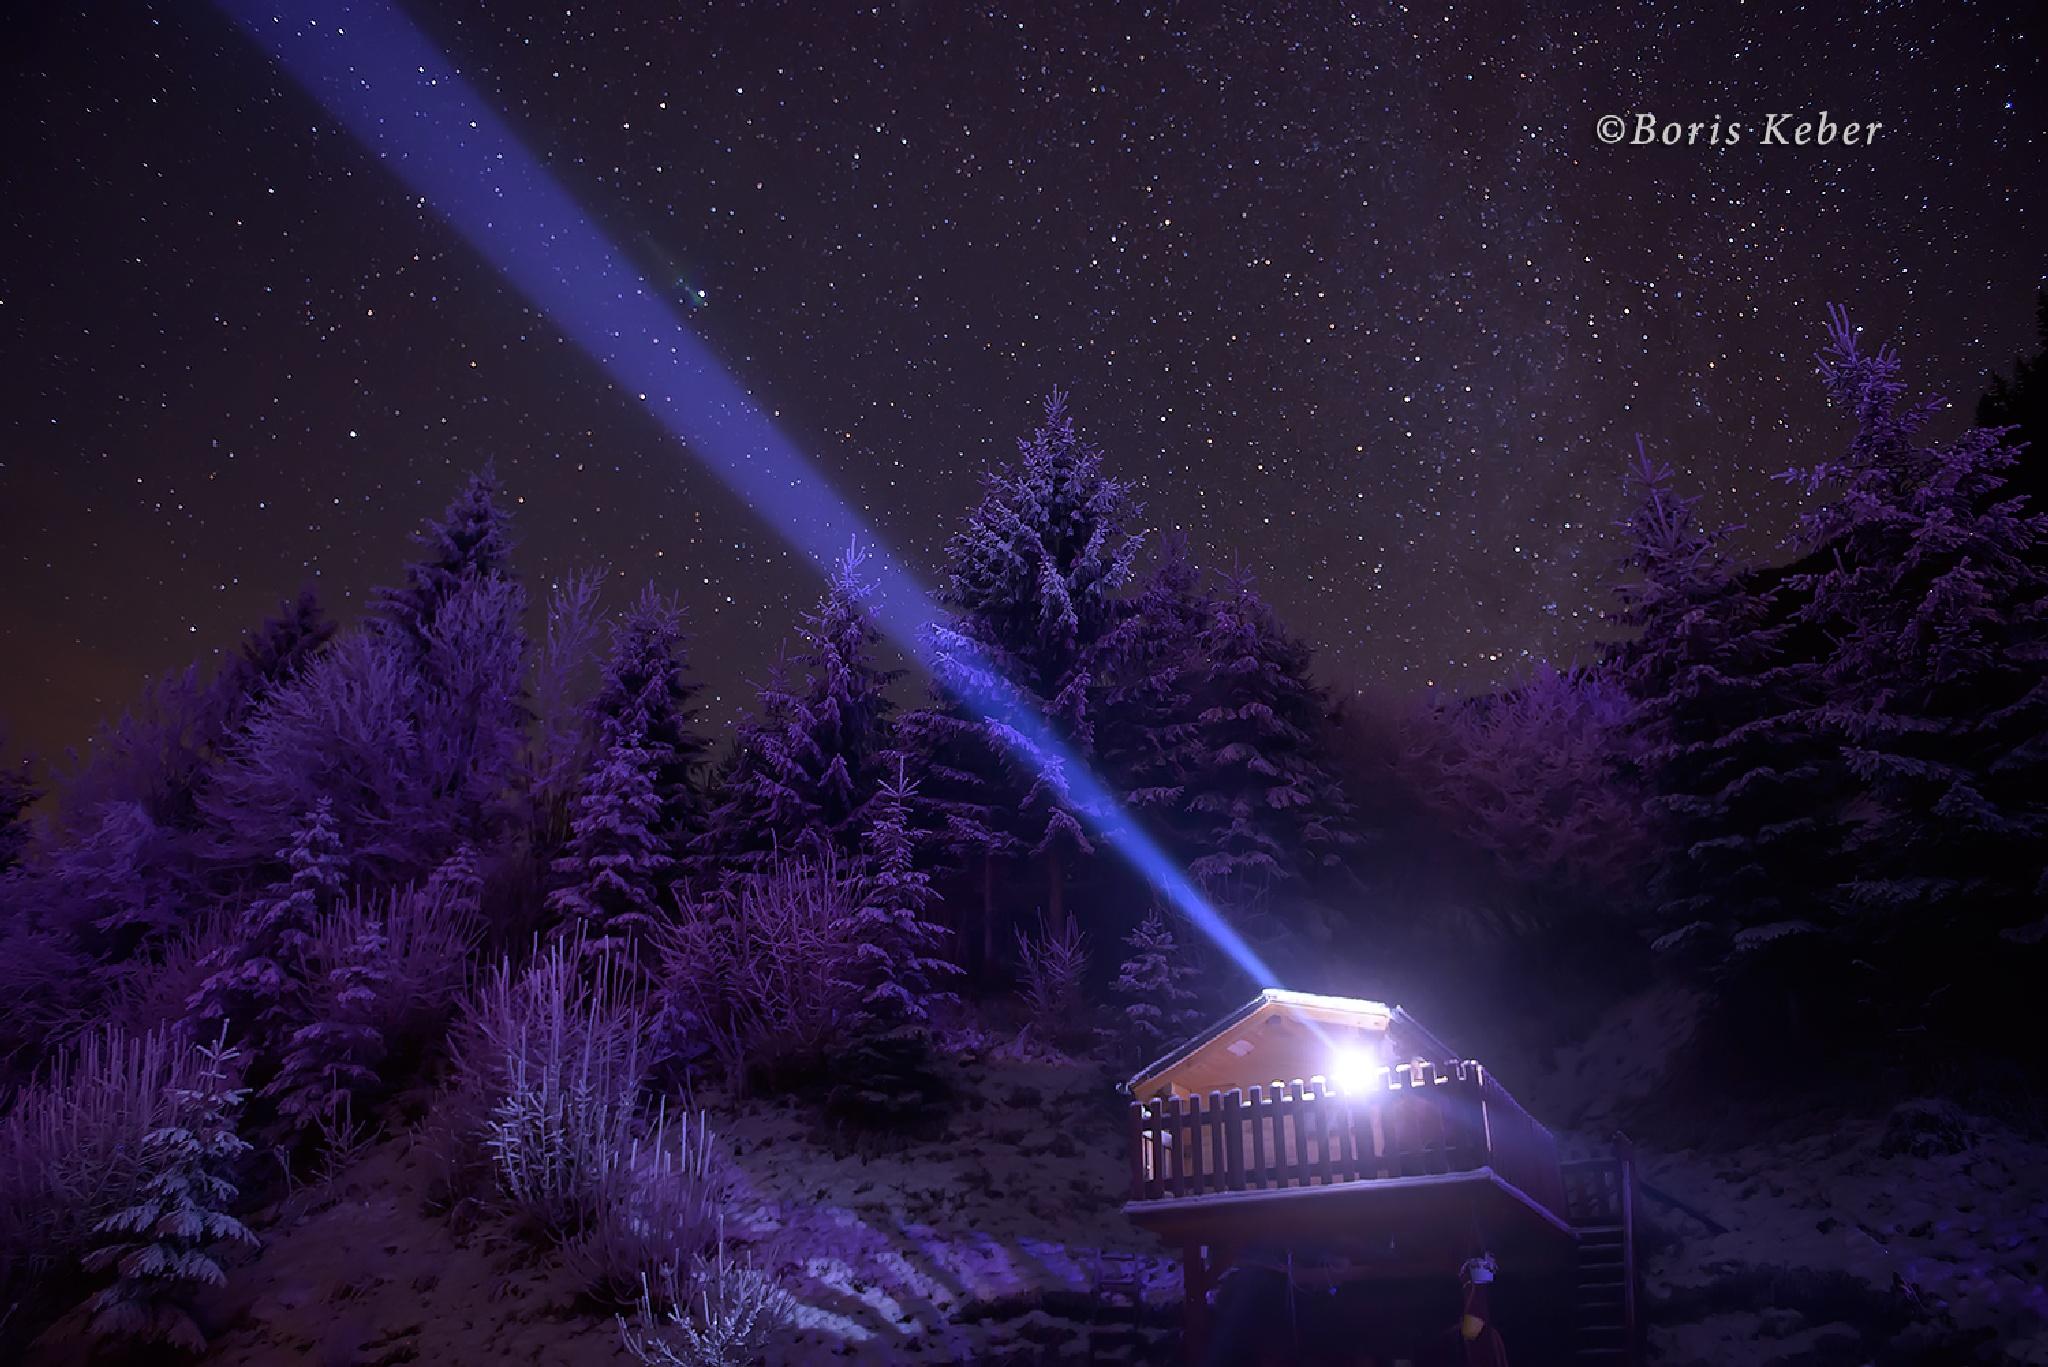 star lighthouse by smelcar